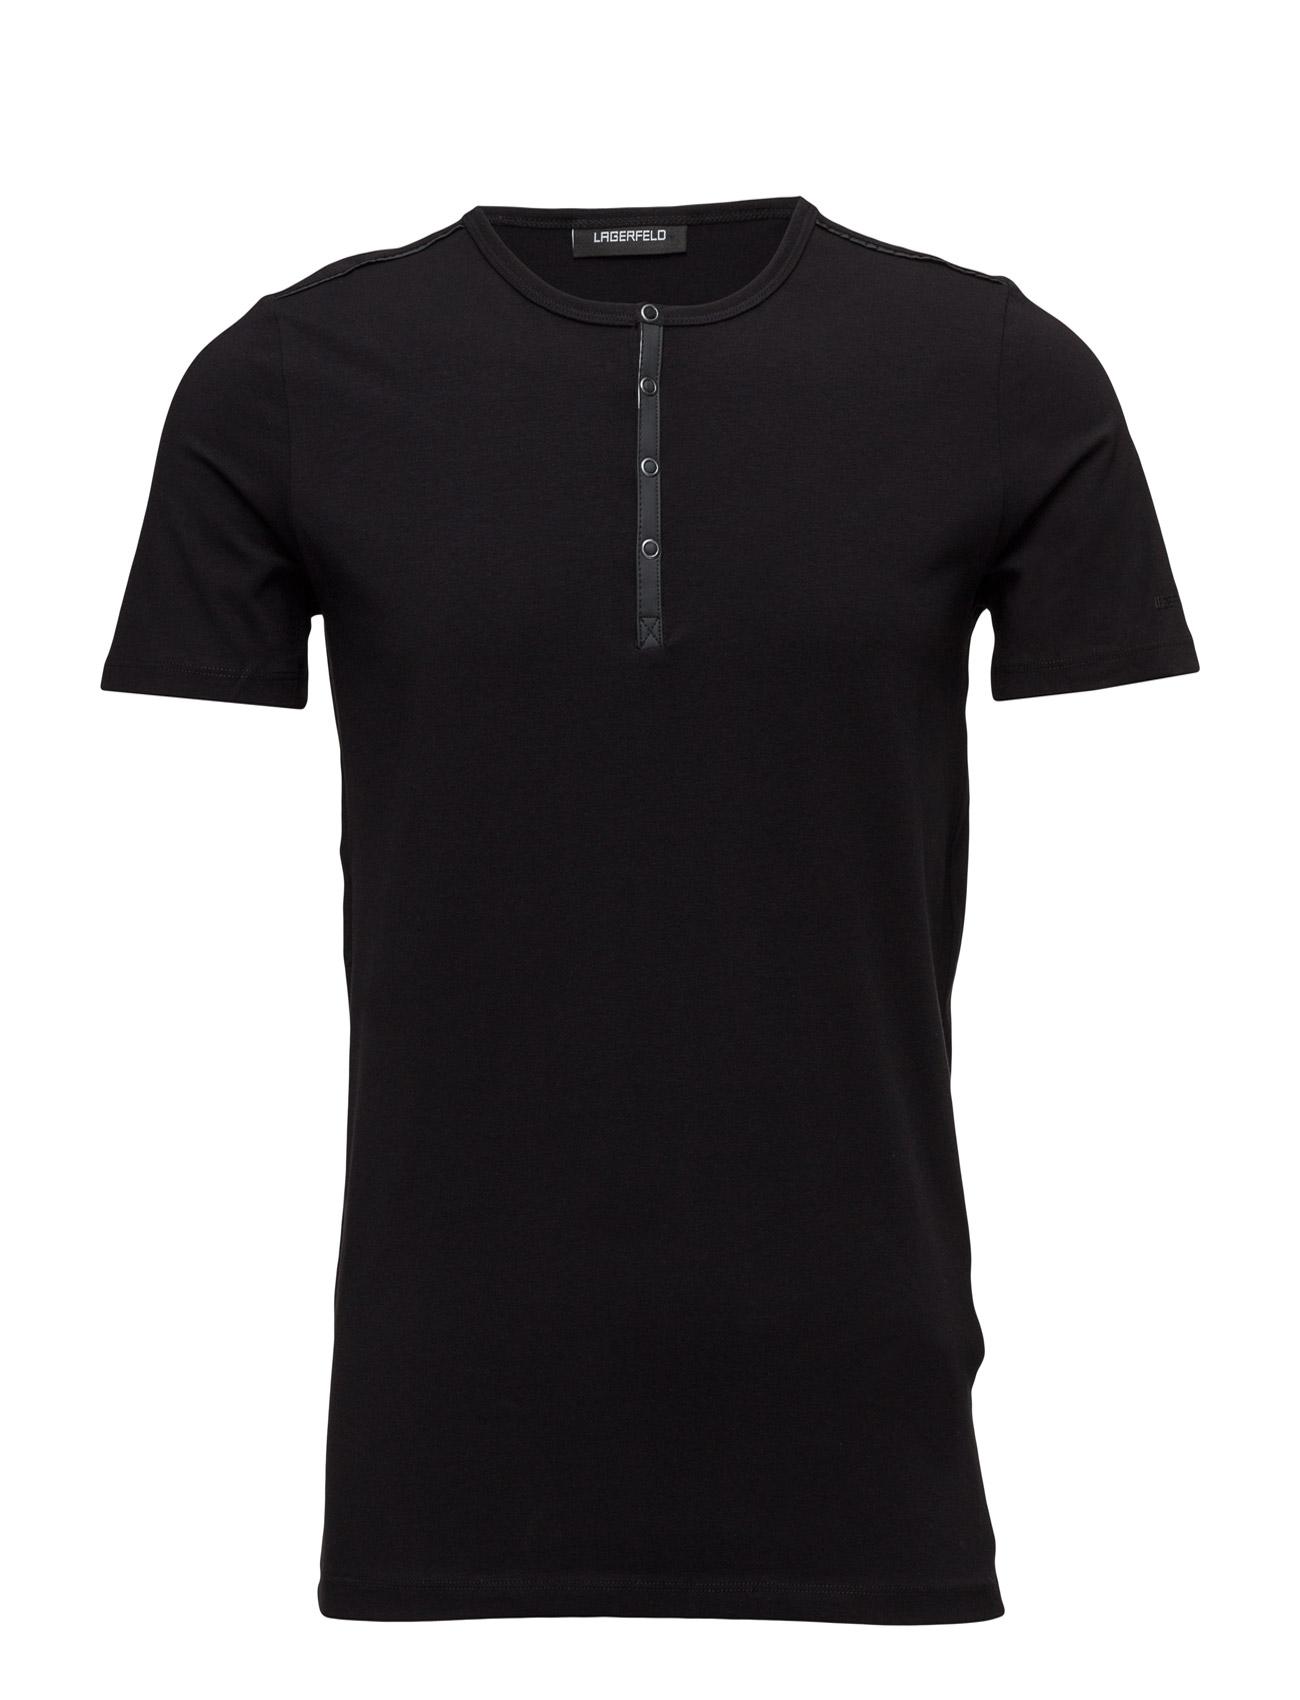 lagerfeld – T shirt roundneck på boozt.com dk